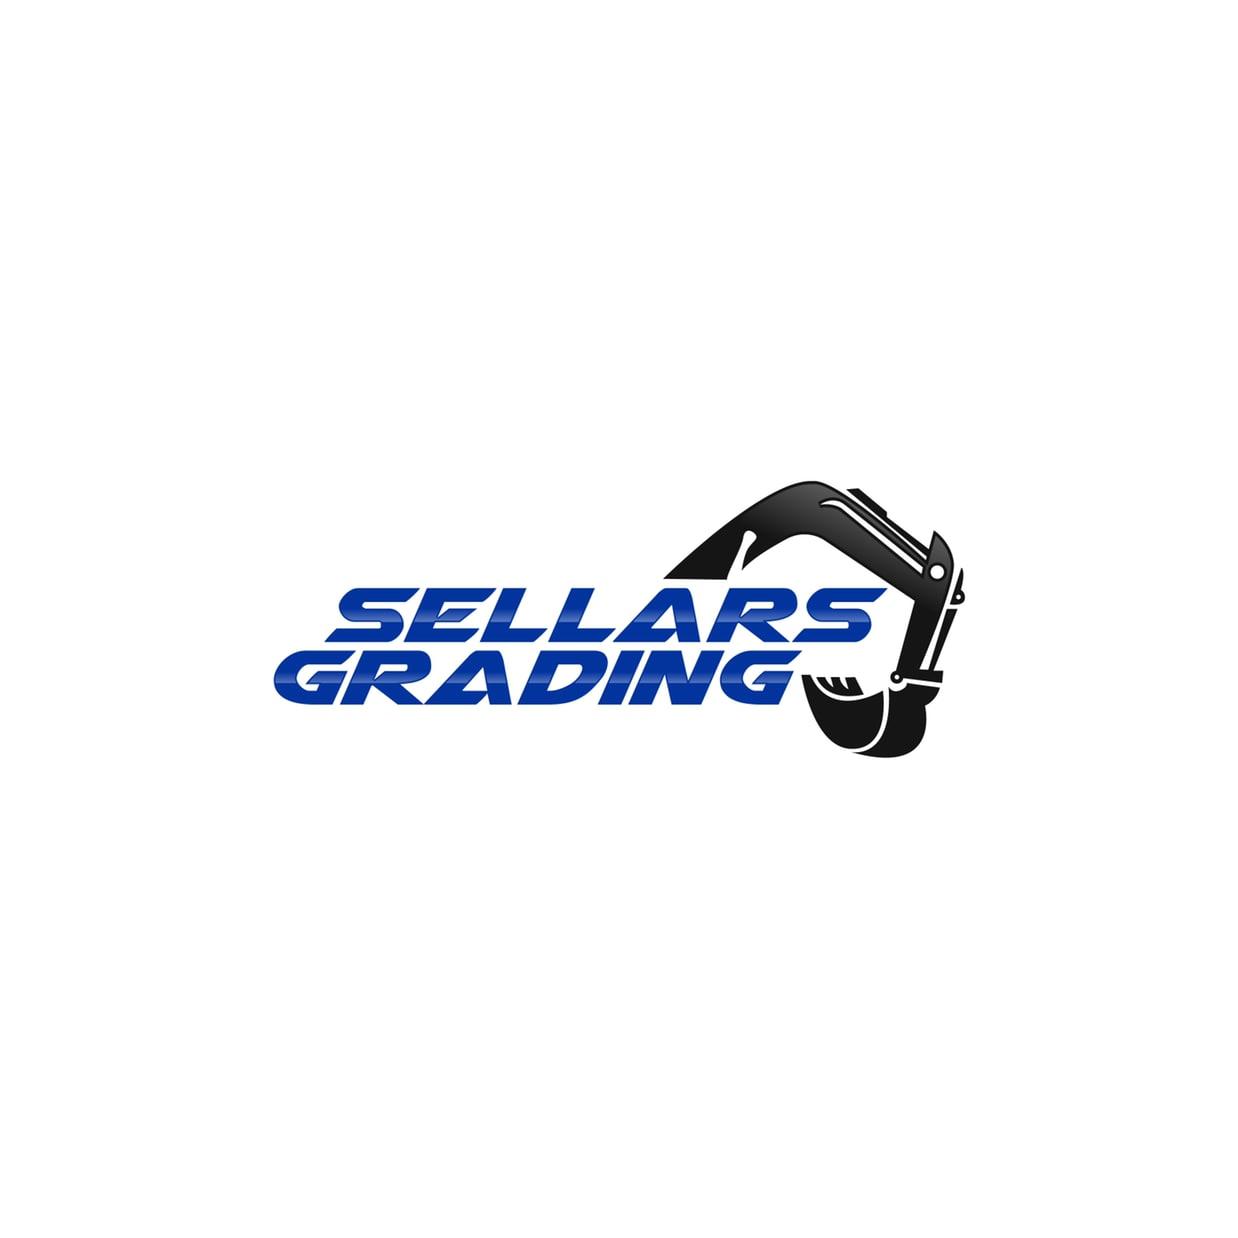 Sellars Grading